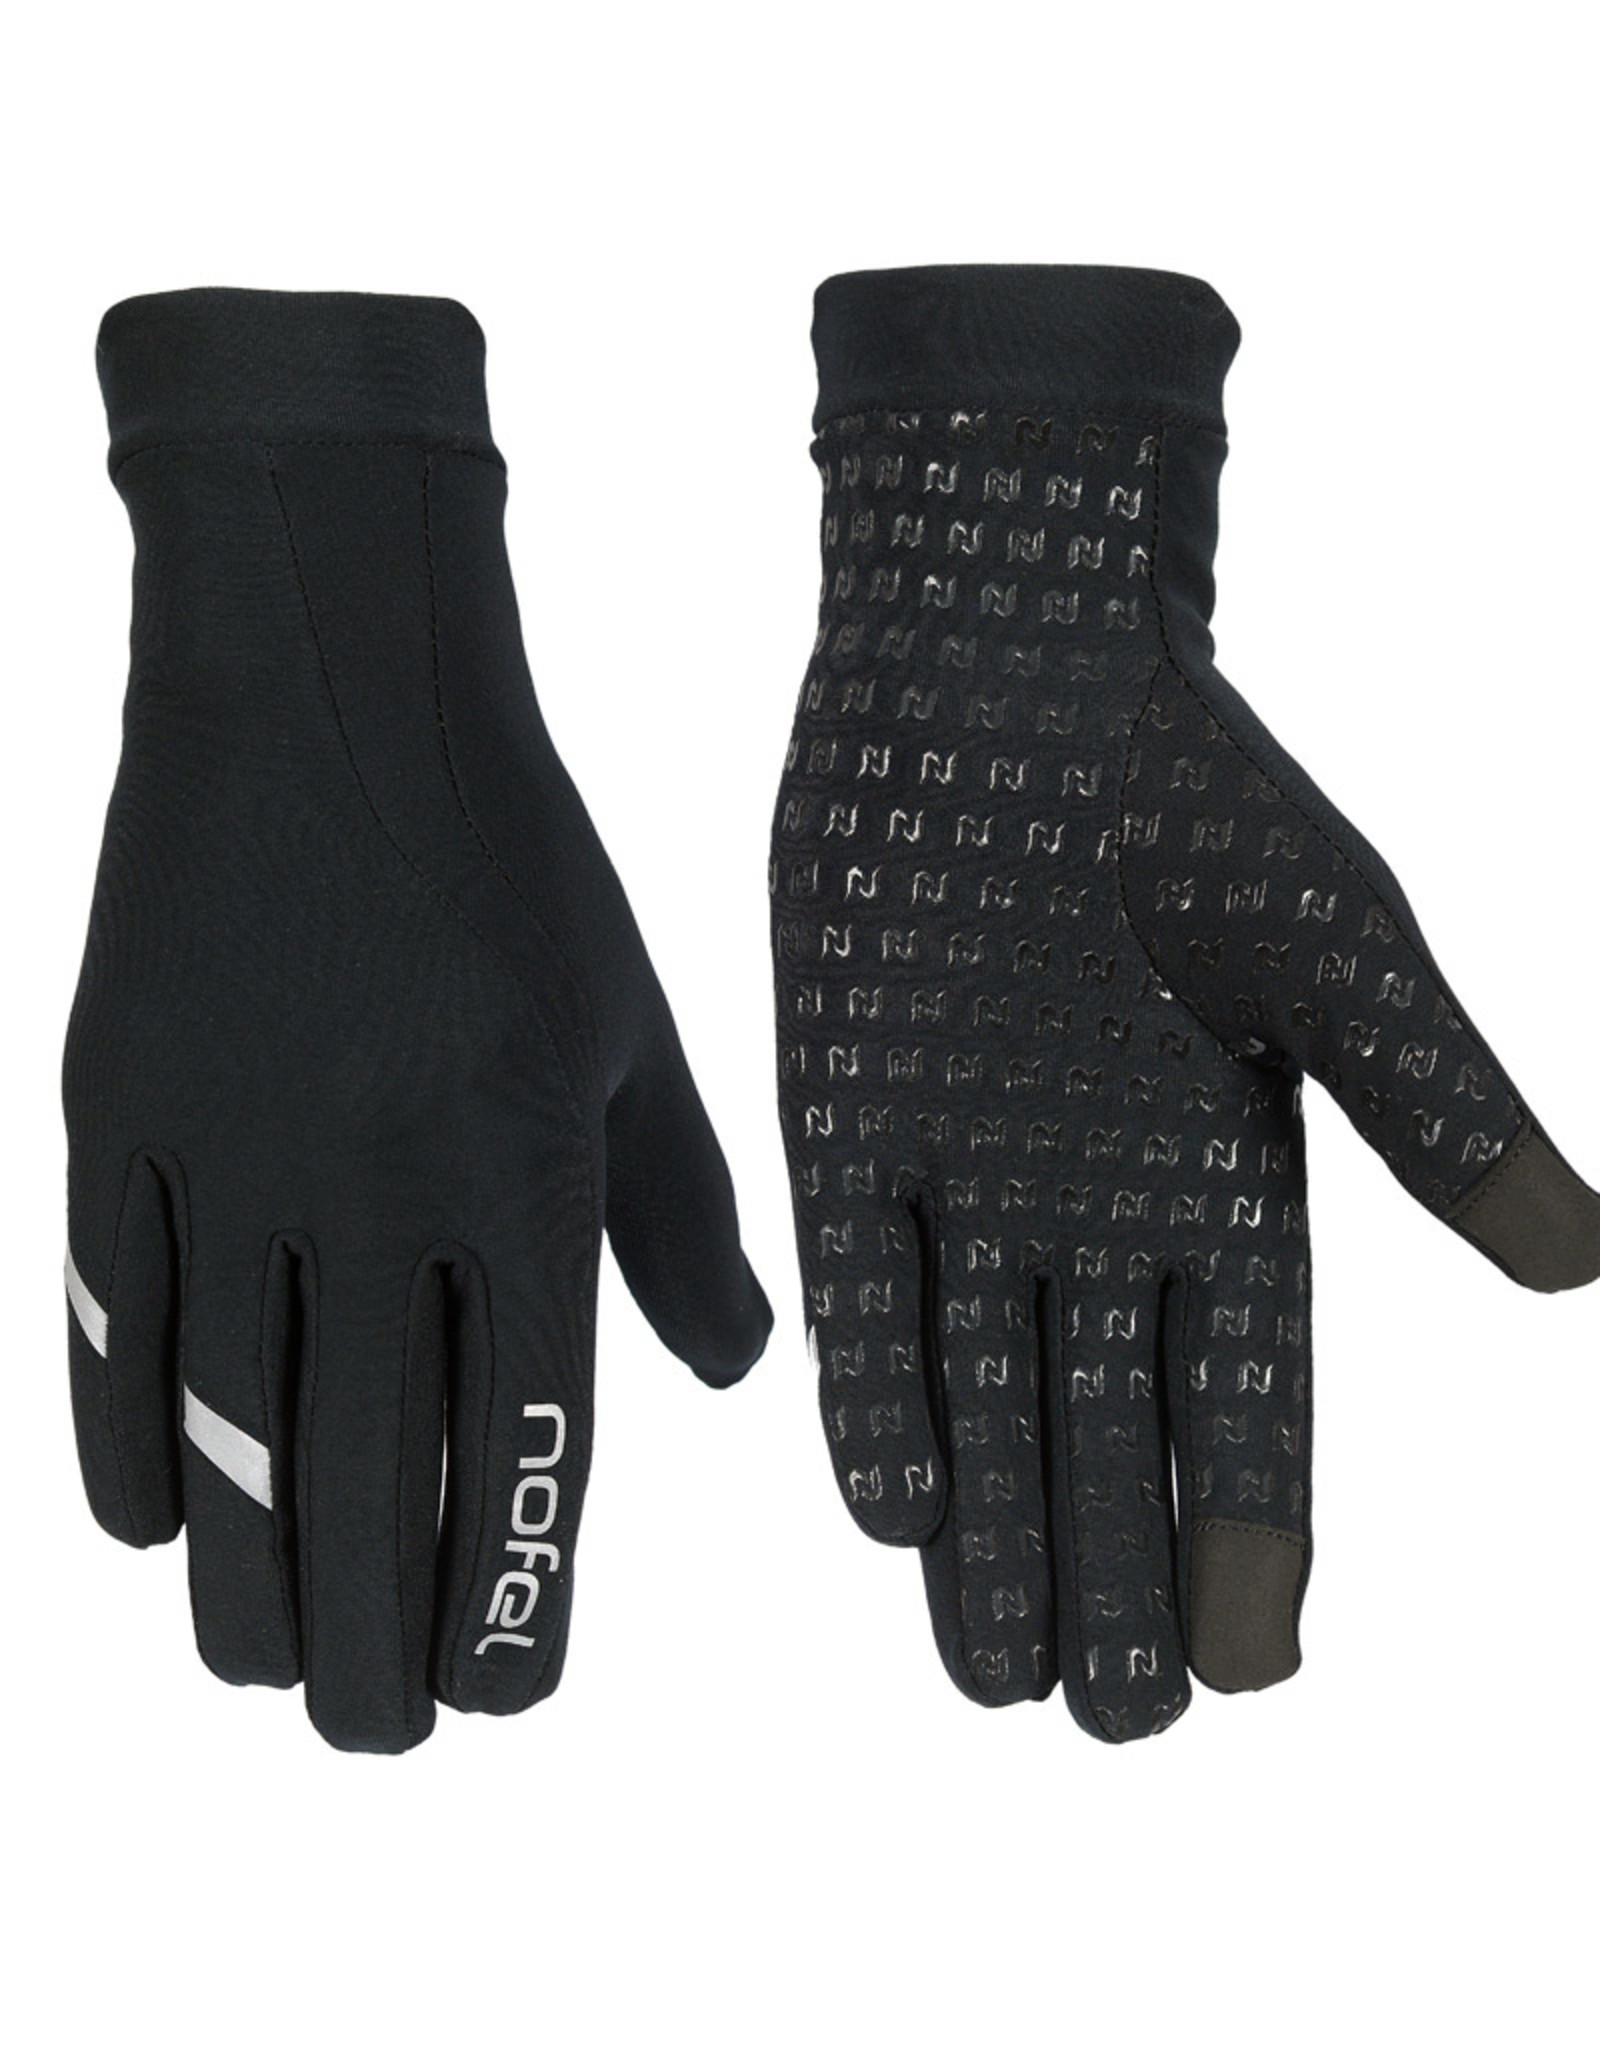 NOFEL Flash Glove